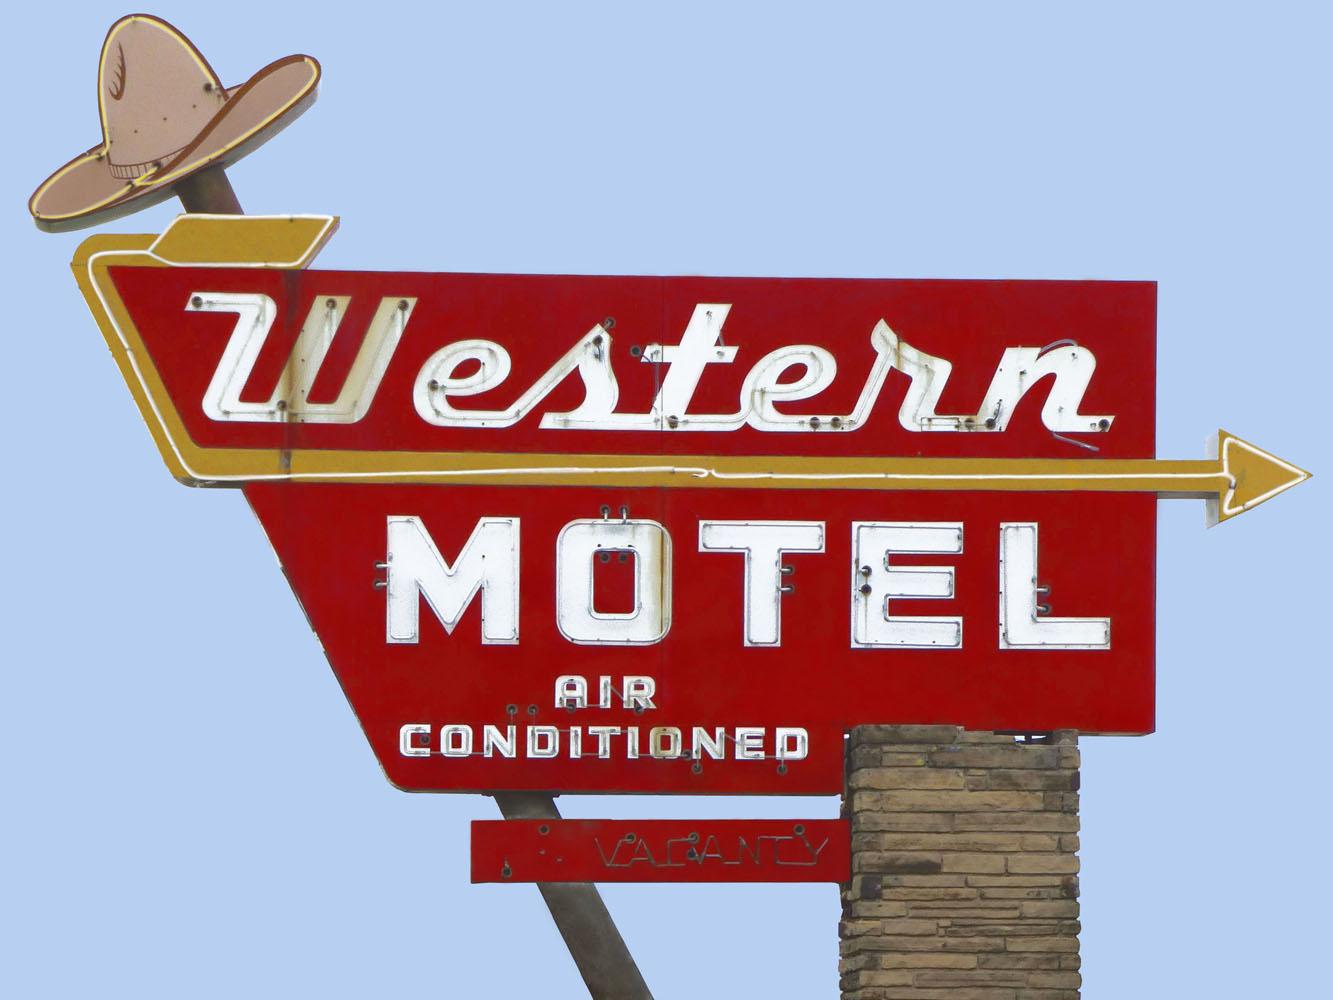 Western Motel Vintage Neon Sign Photo